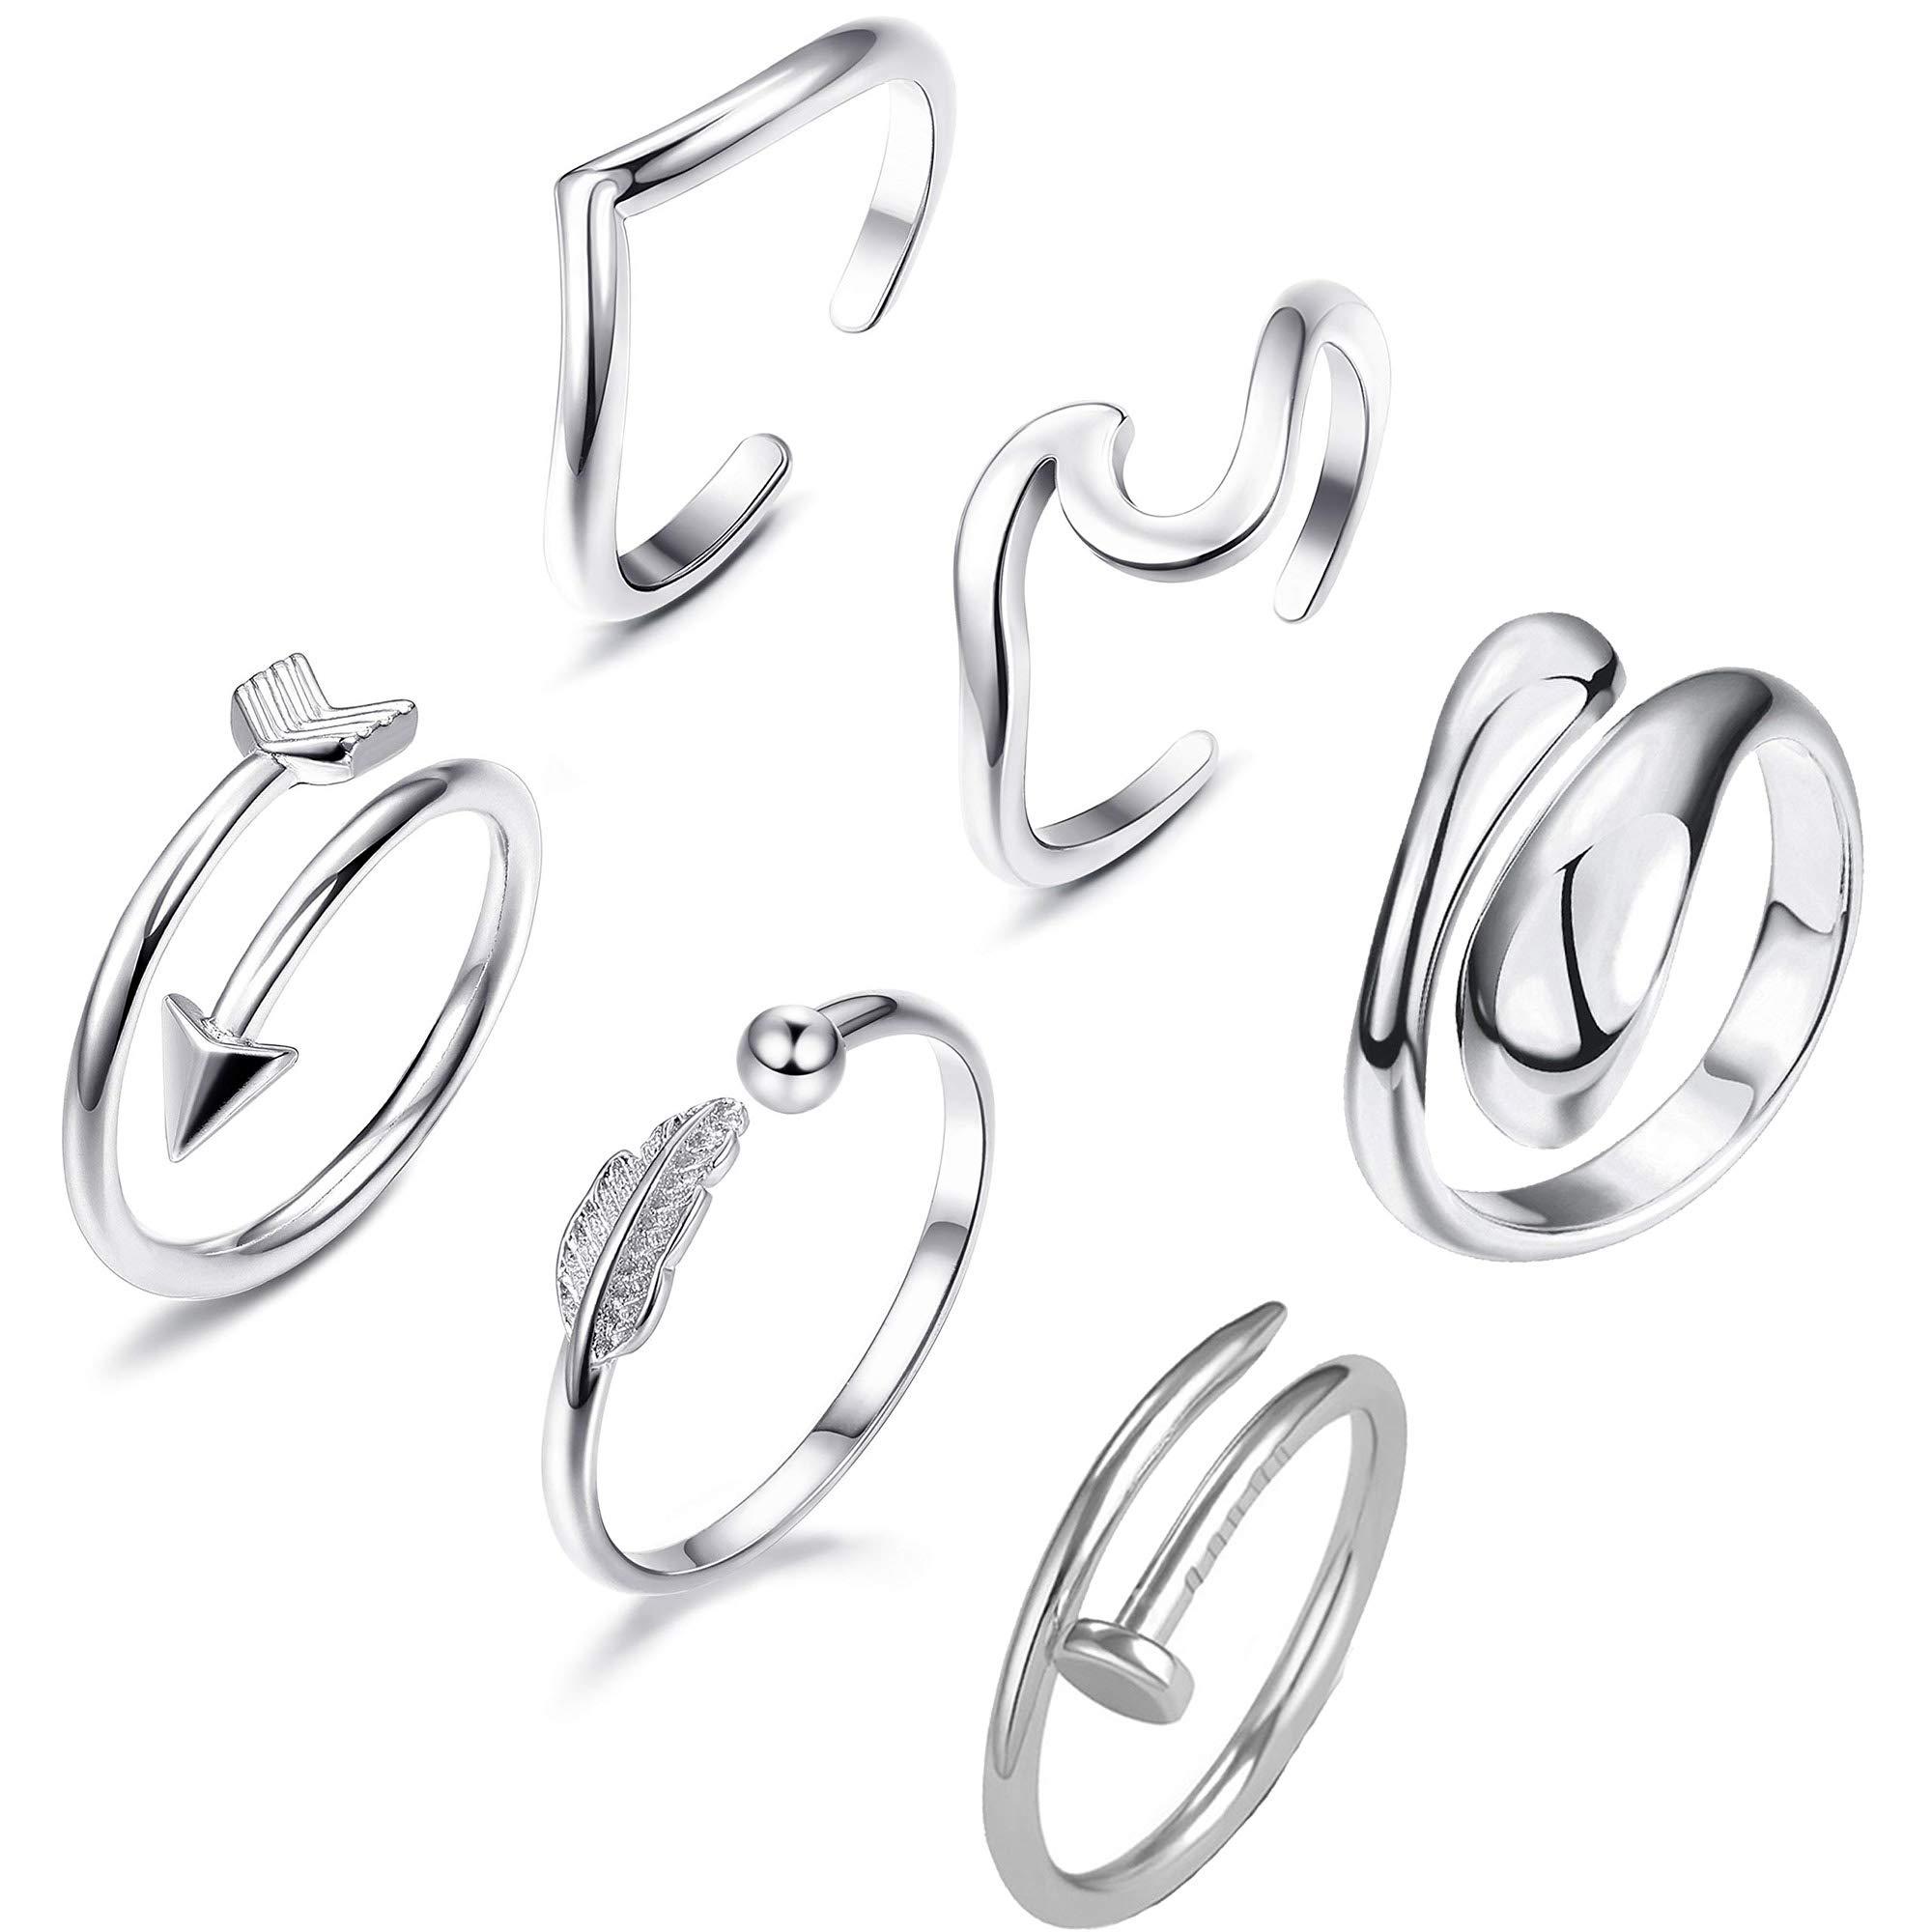 MJ 6 Pcs Adjustable Rings Set Arrow Wave Teardrop Stackable Thumb Rings for Women Minimalist Toe Finger Tail Band Adjustable Rings Hawaiian Jewelry